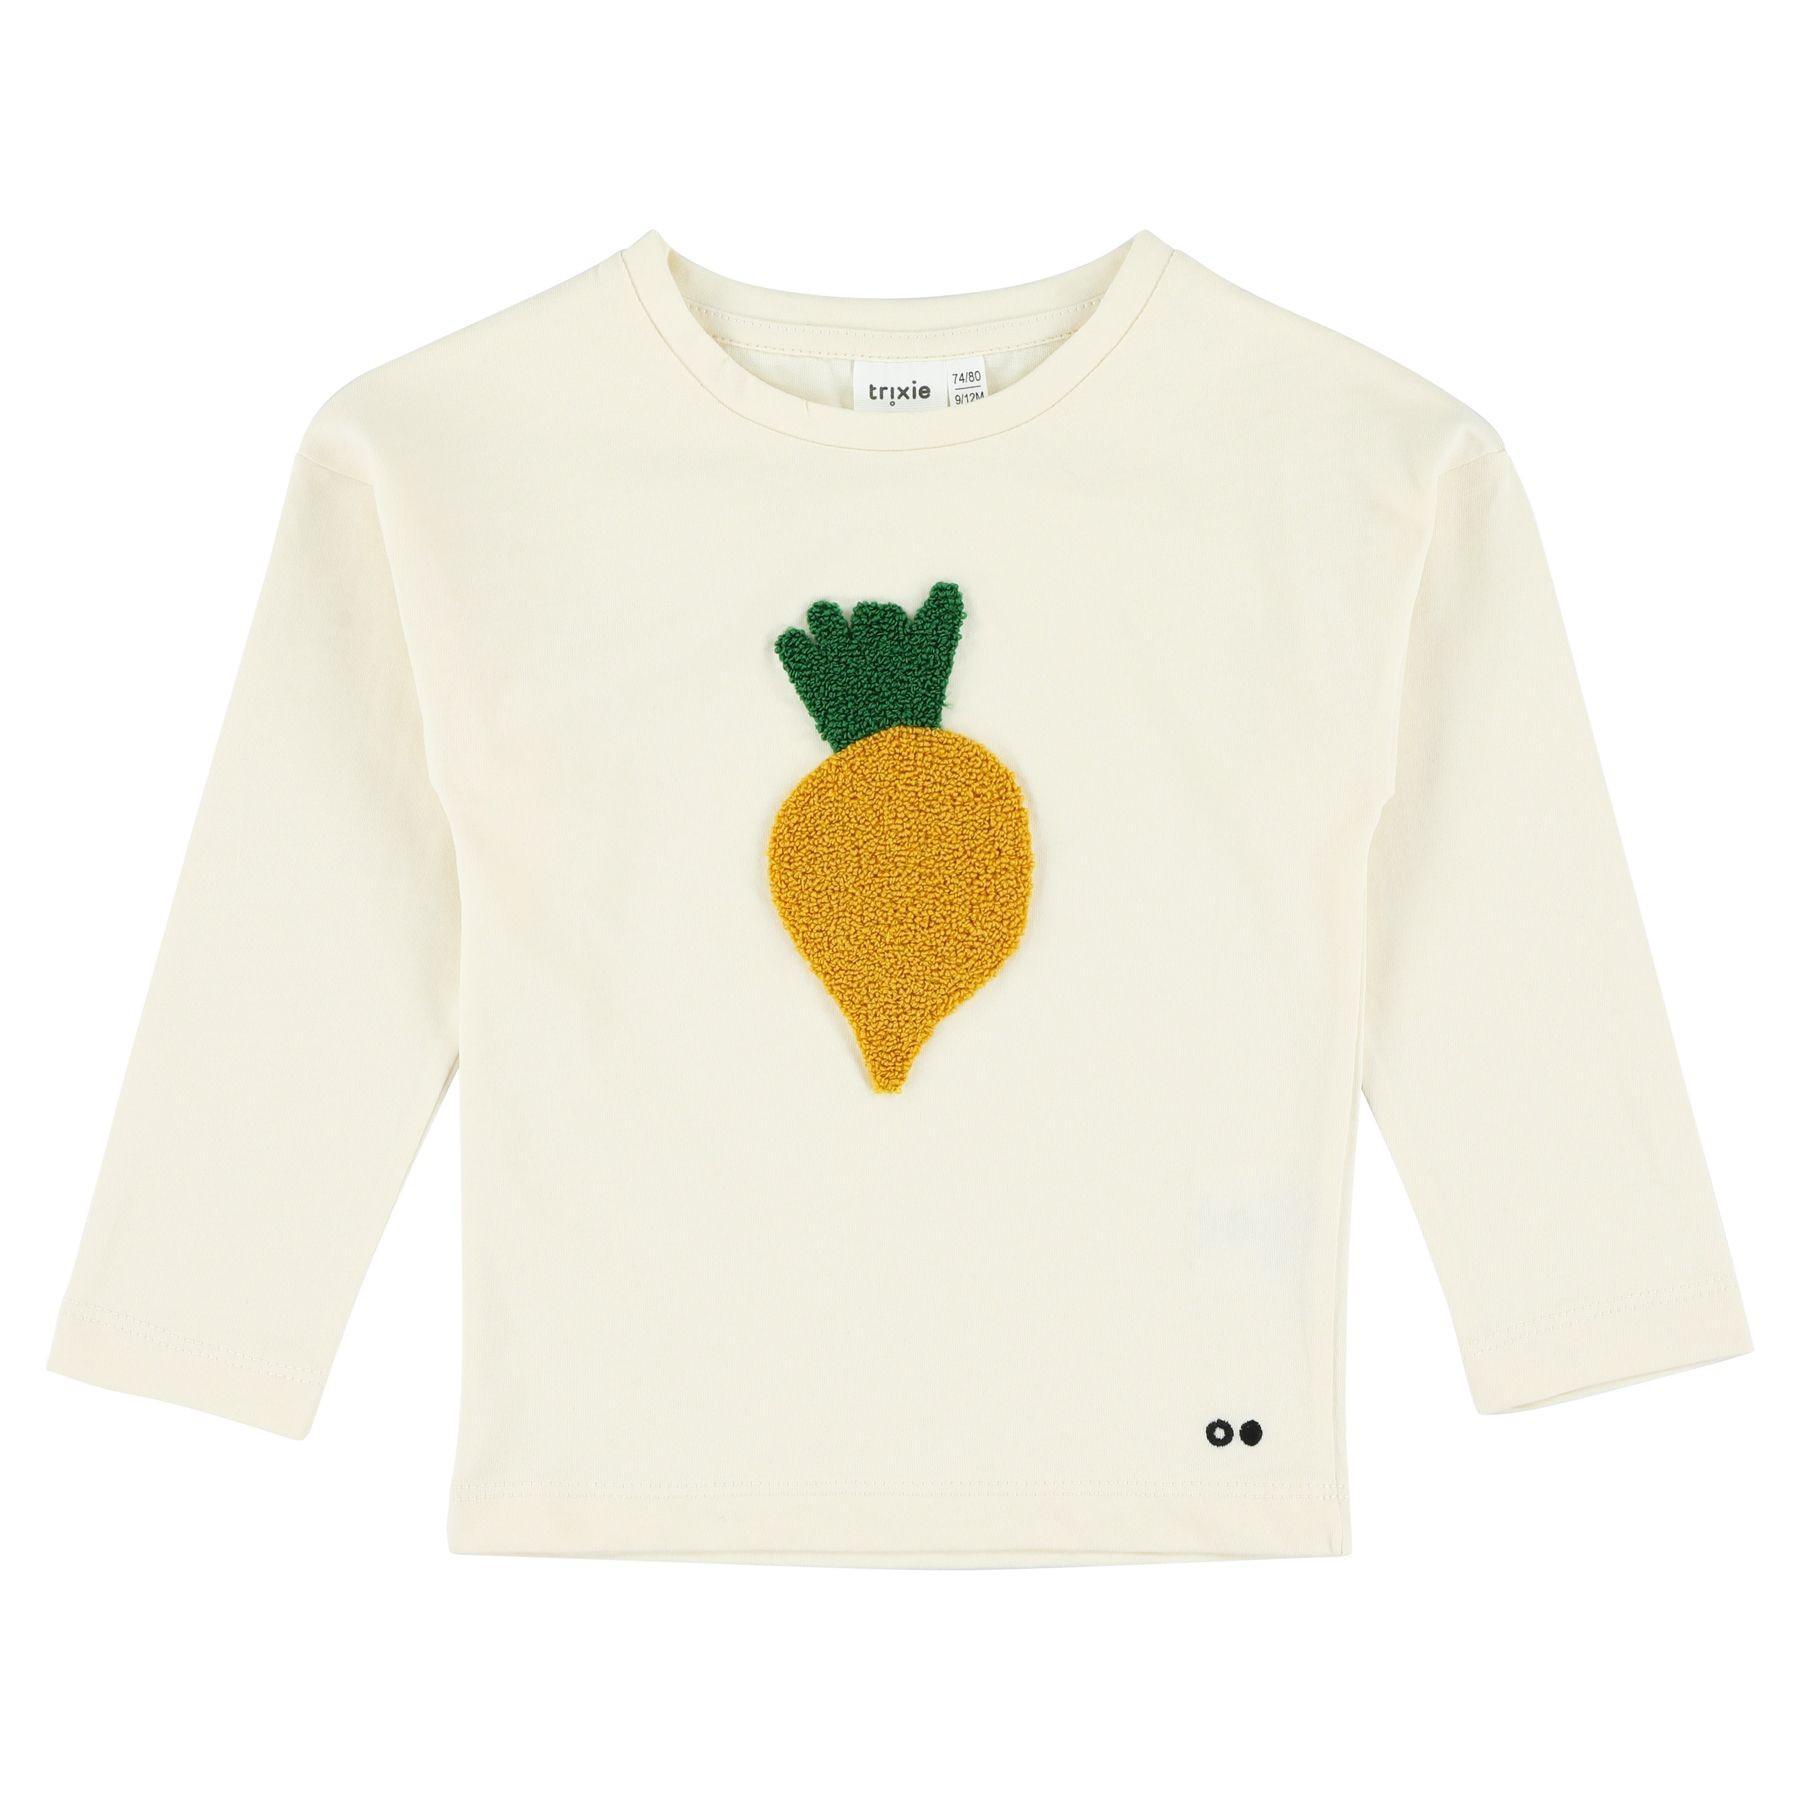 Trixie - T-shirt lange mouwen Tiny Turnip - 4Y